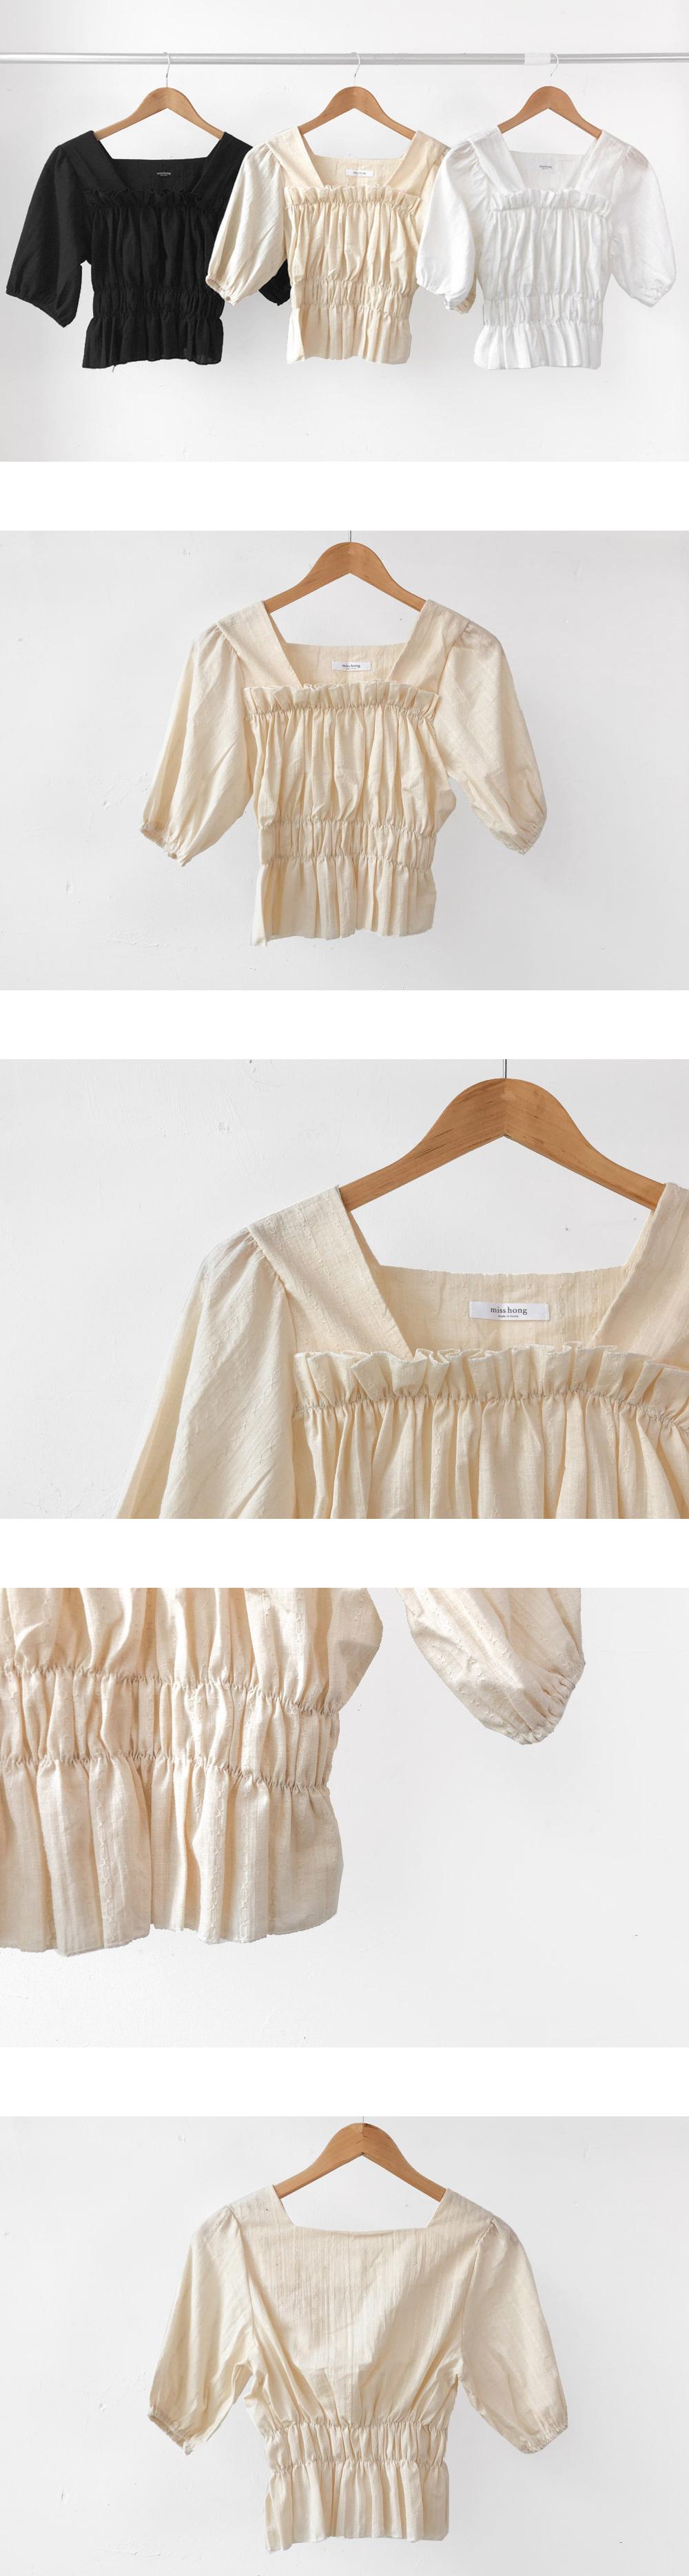 Ray shirred short-sleeved blouse